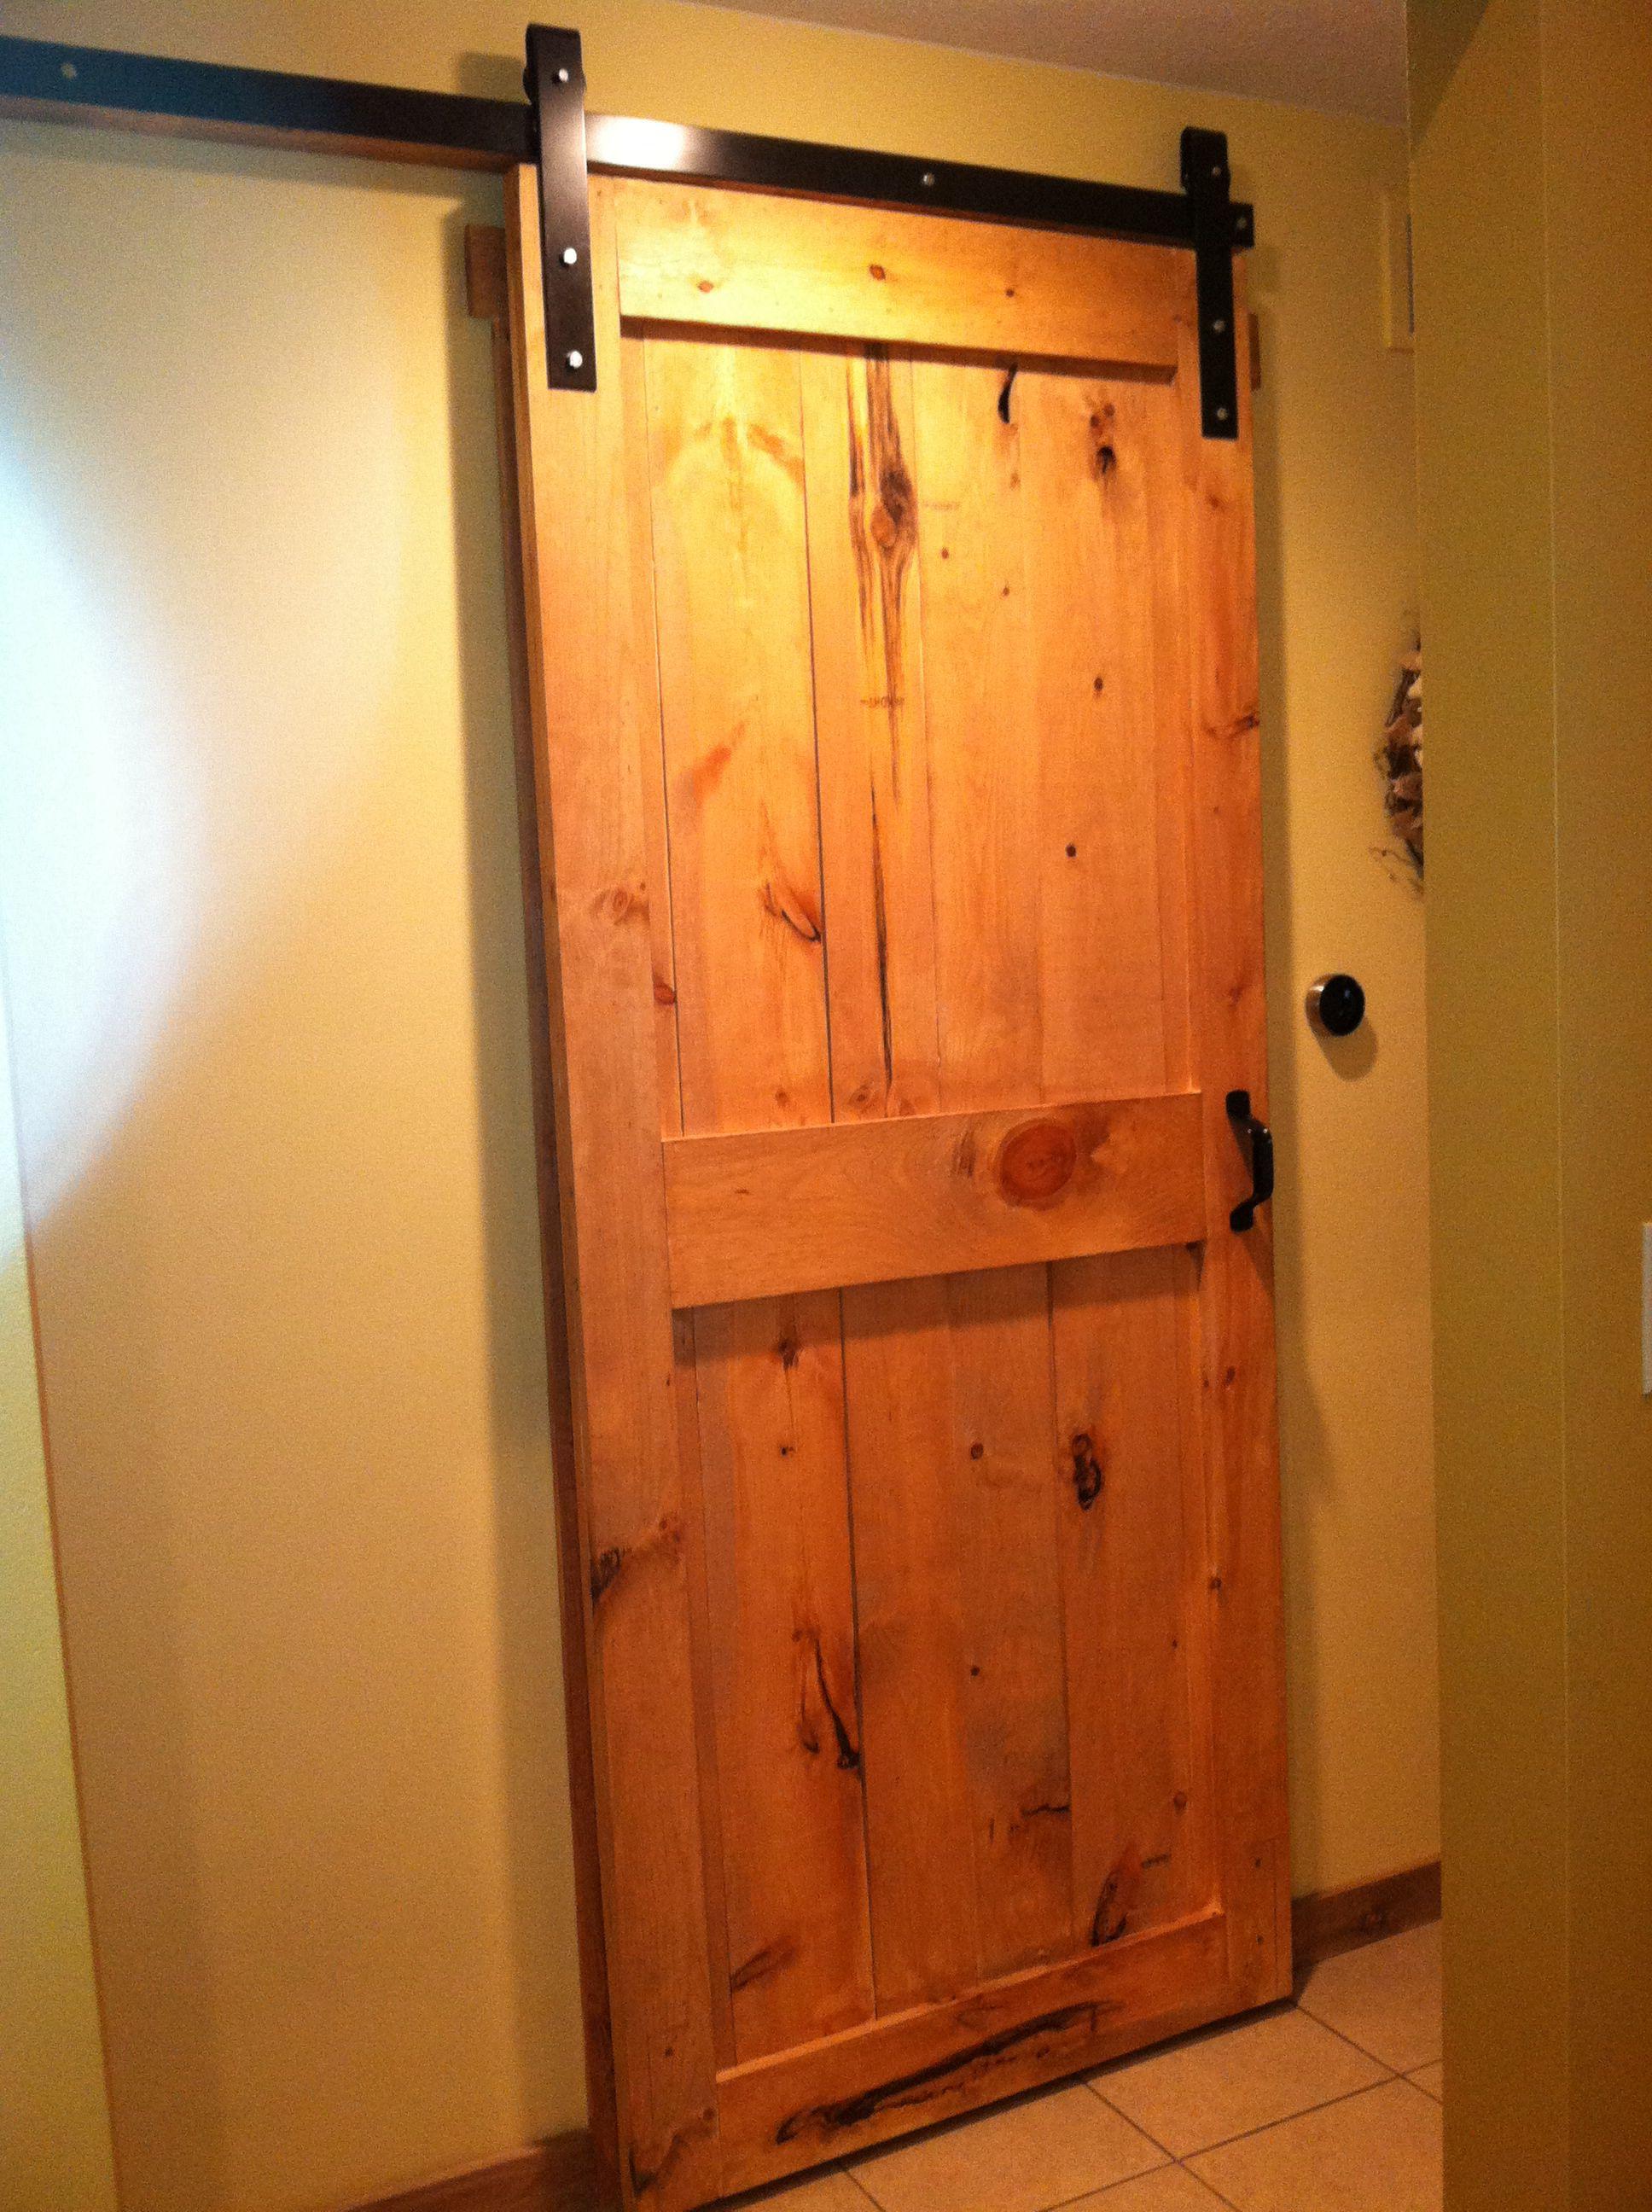 Diy Barn Door Even Made The Hardware Whole Project Under 150 Exterior Barn Door Hardware Wood Exterior Door Exterior Barn Doors